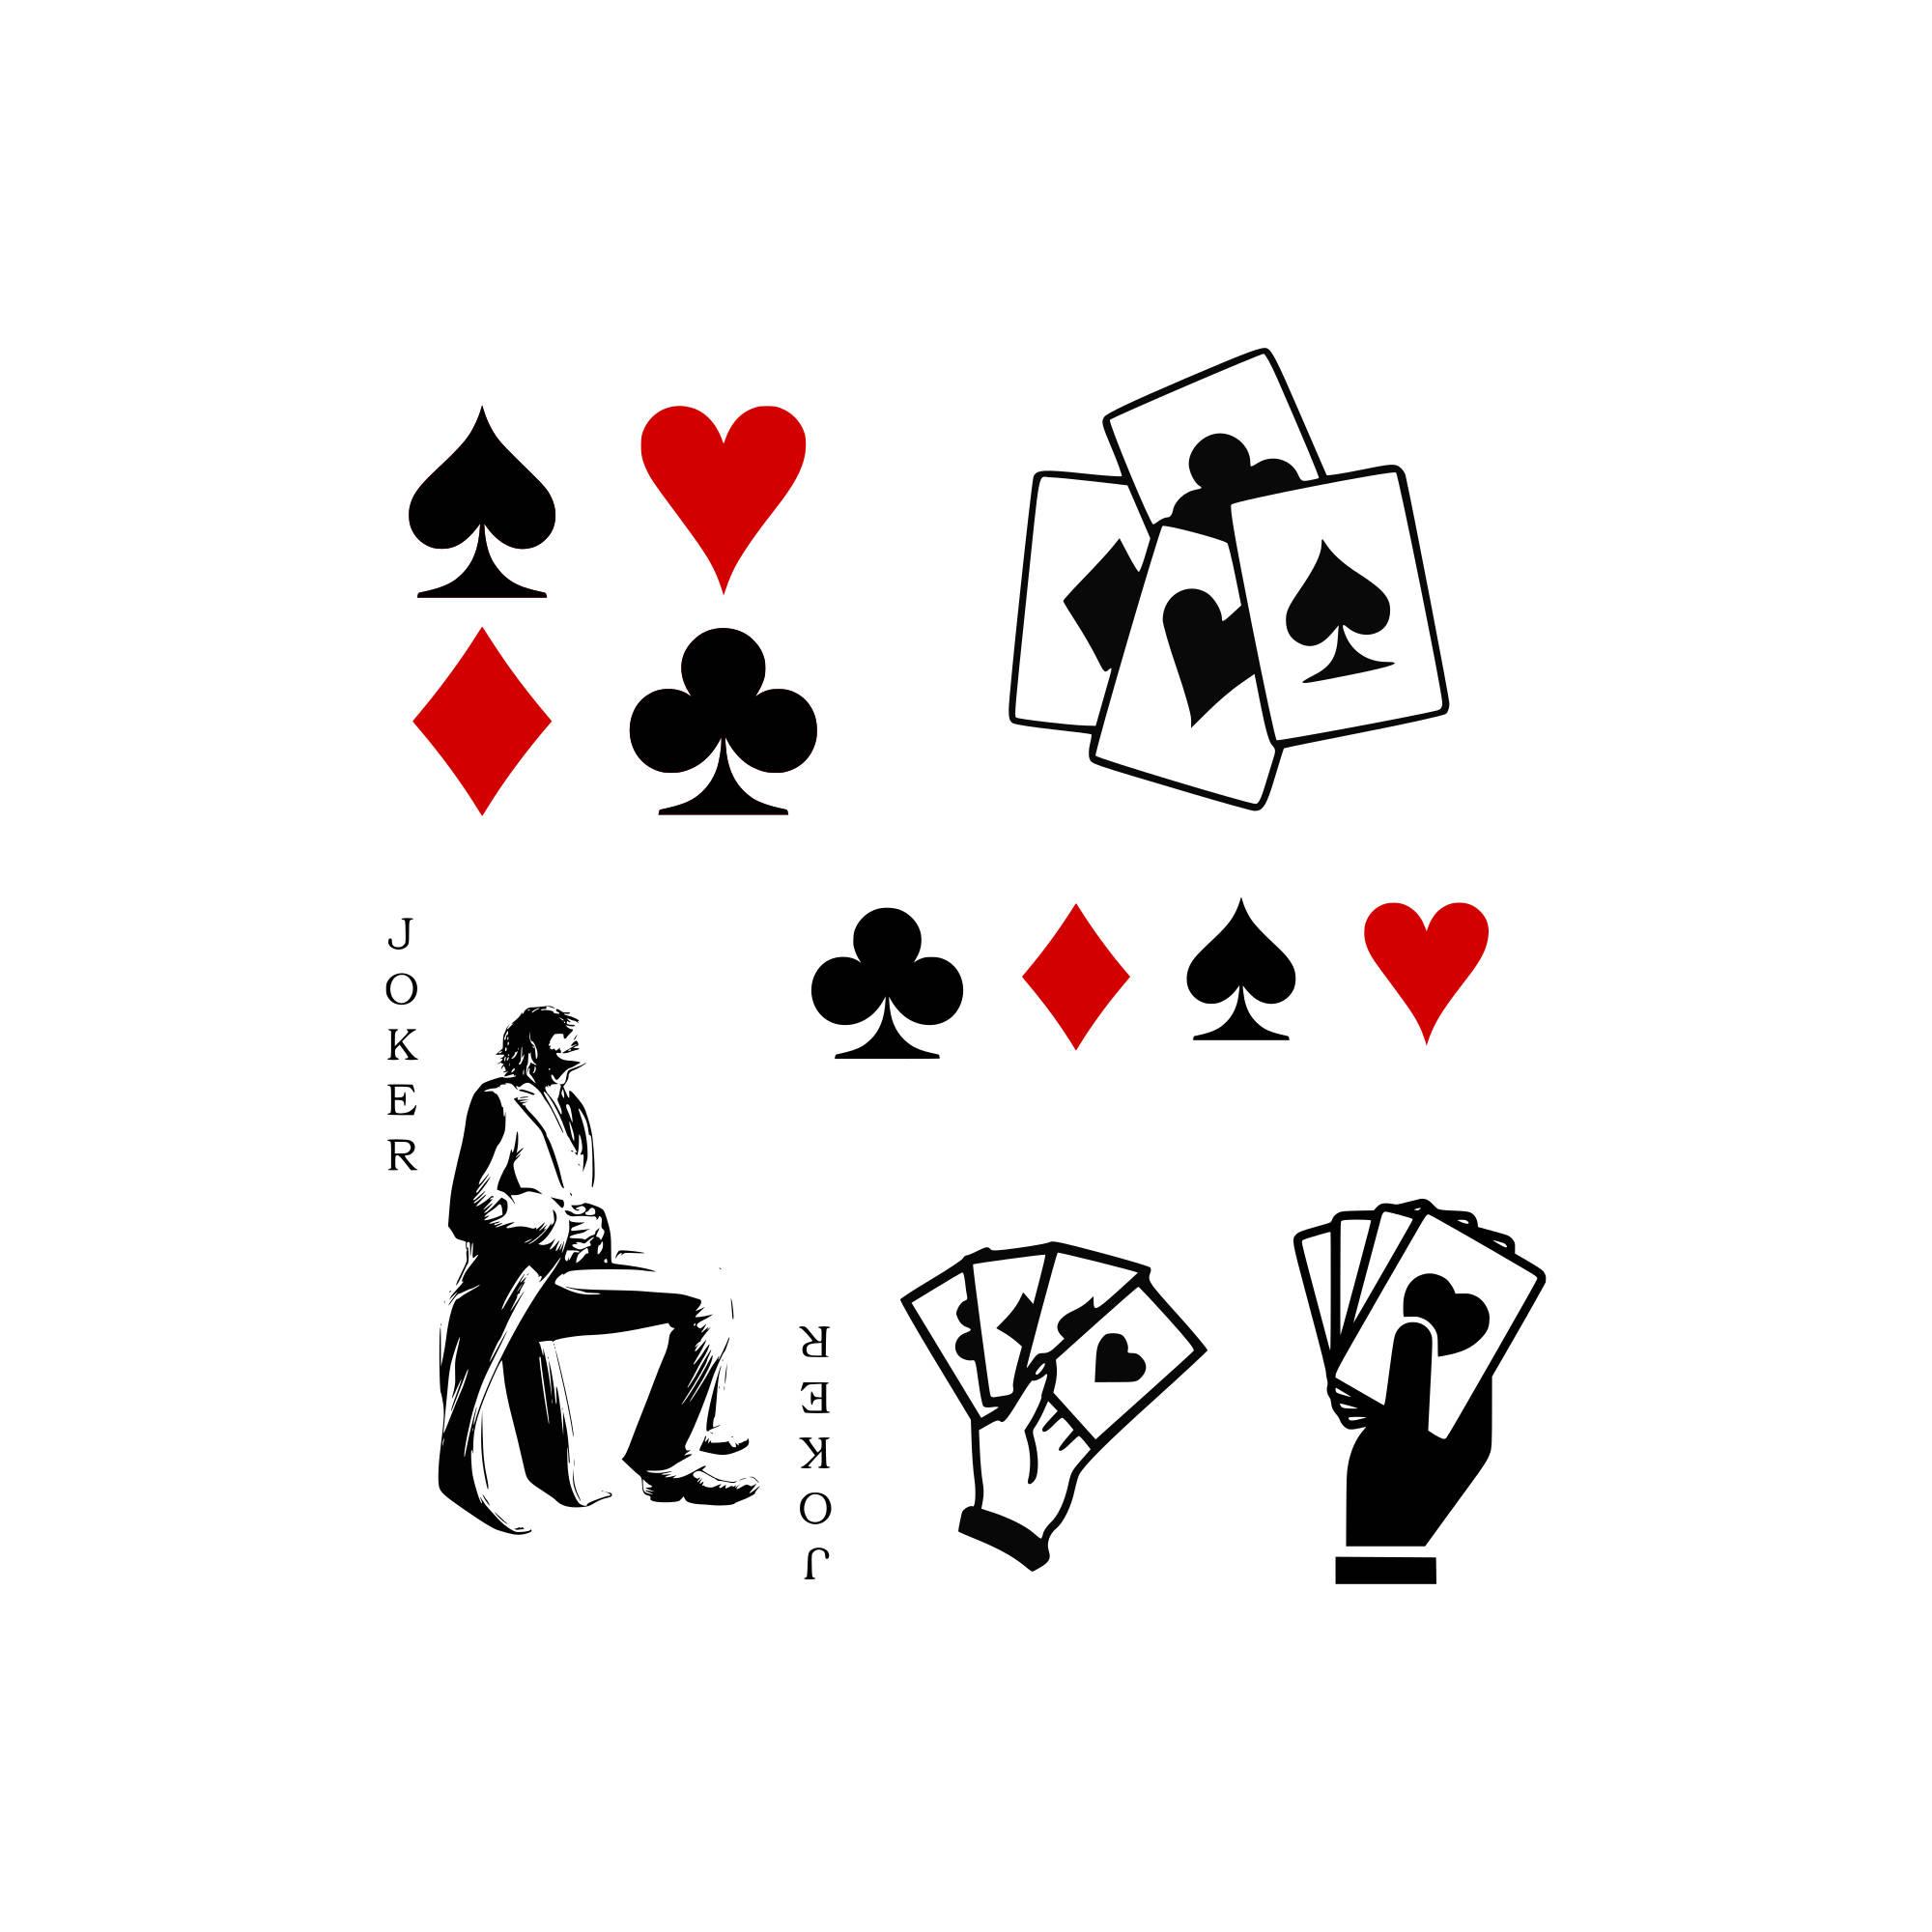 2000x2000 Playing Cards Svg Playing Card Symbols Svg Heart Svg Club Svg